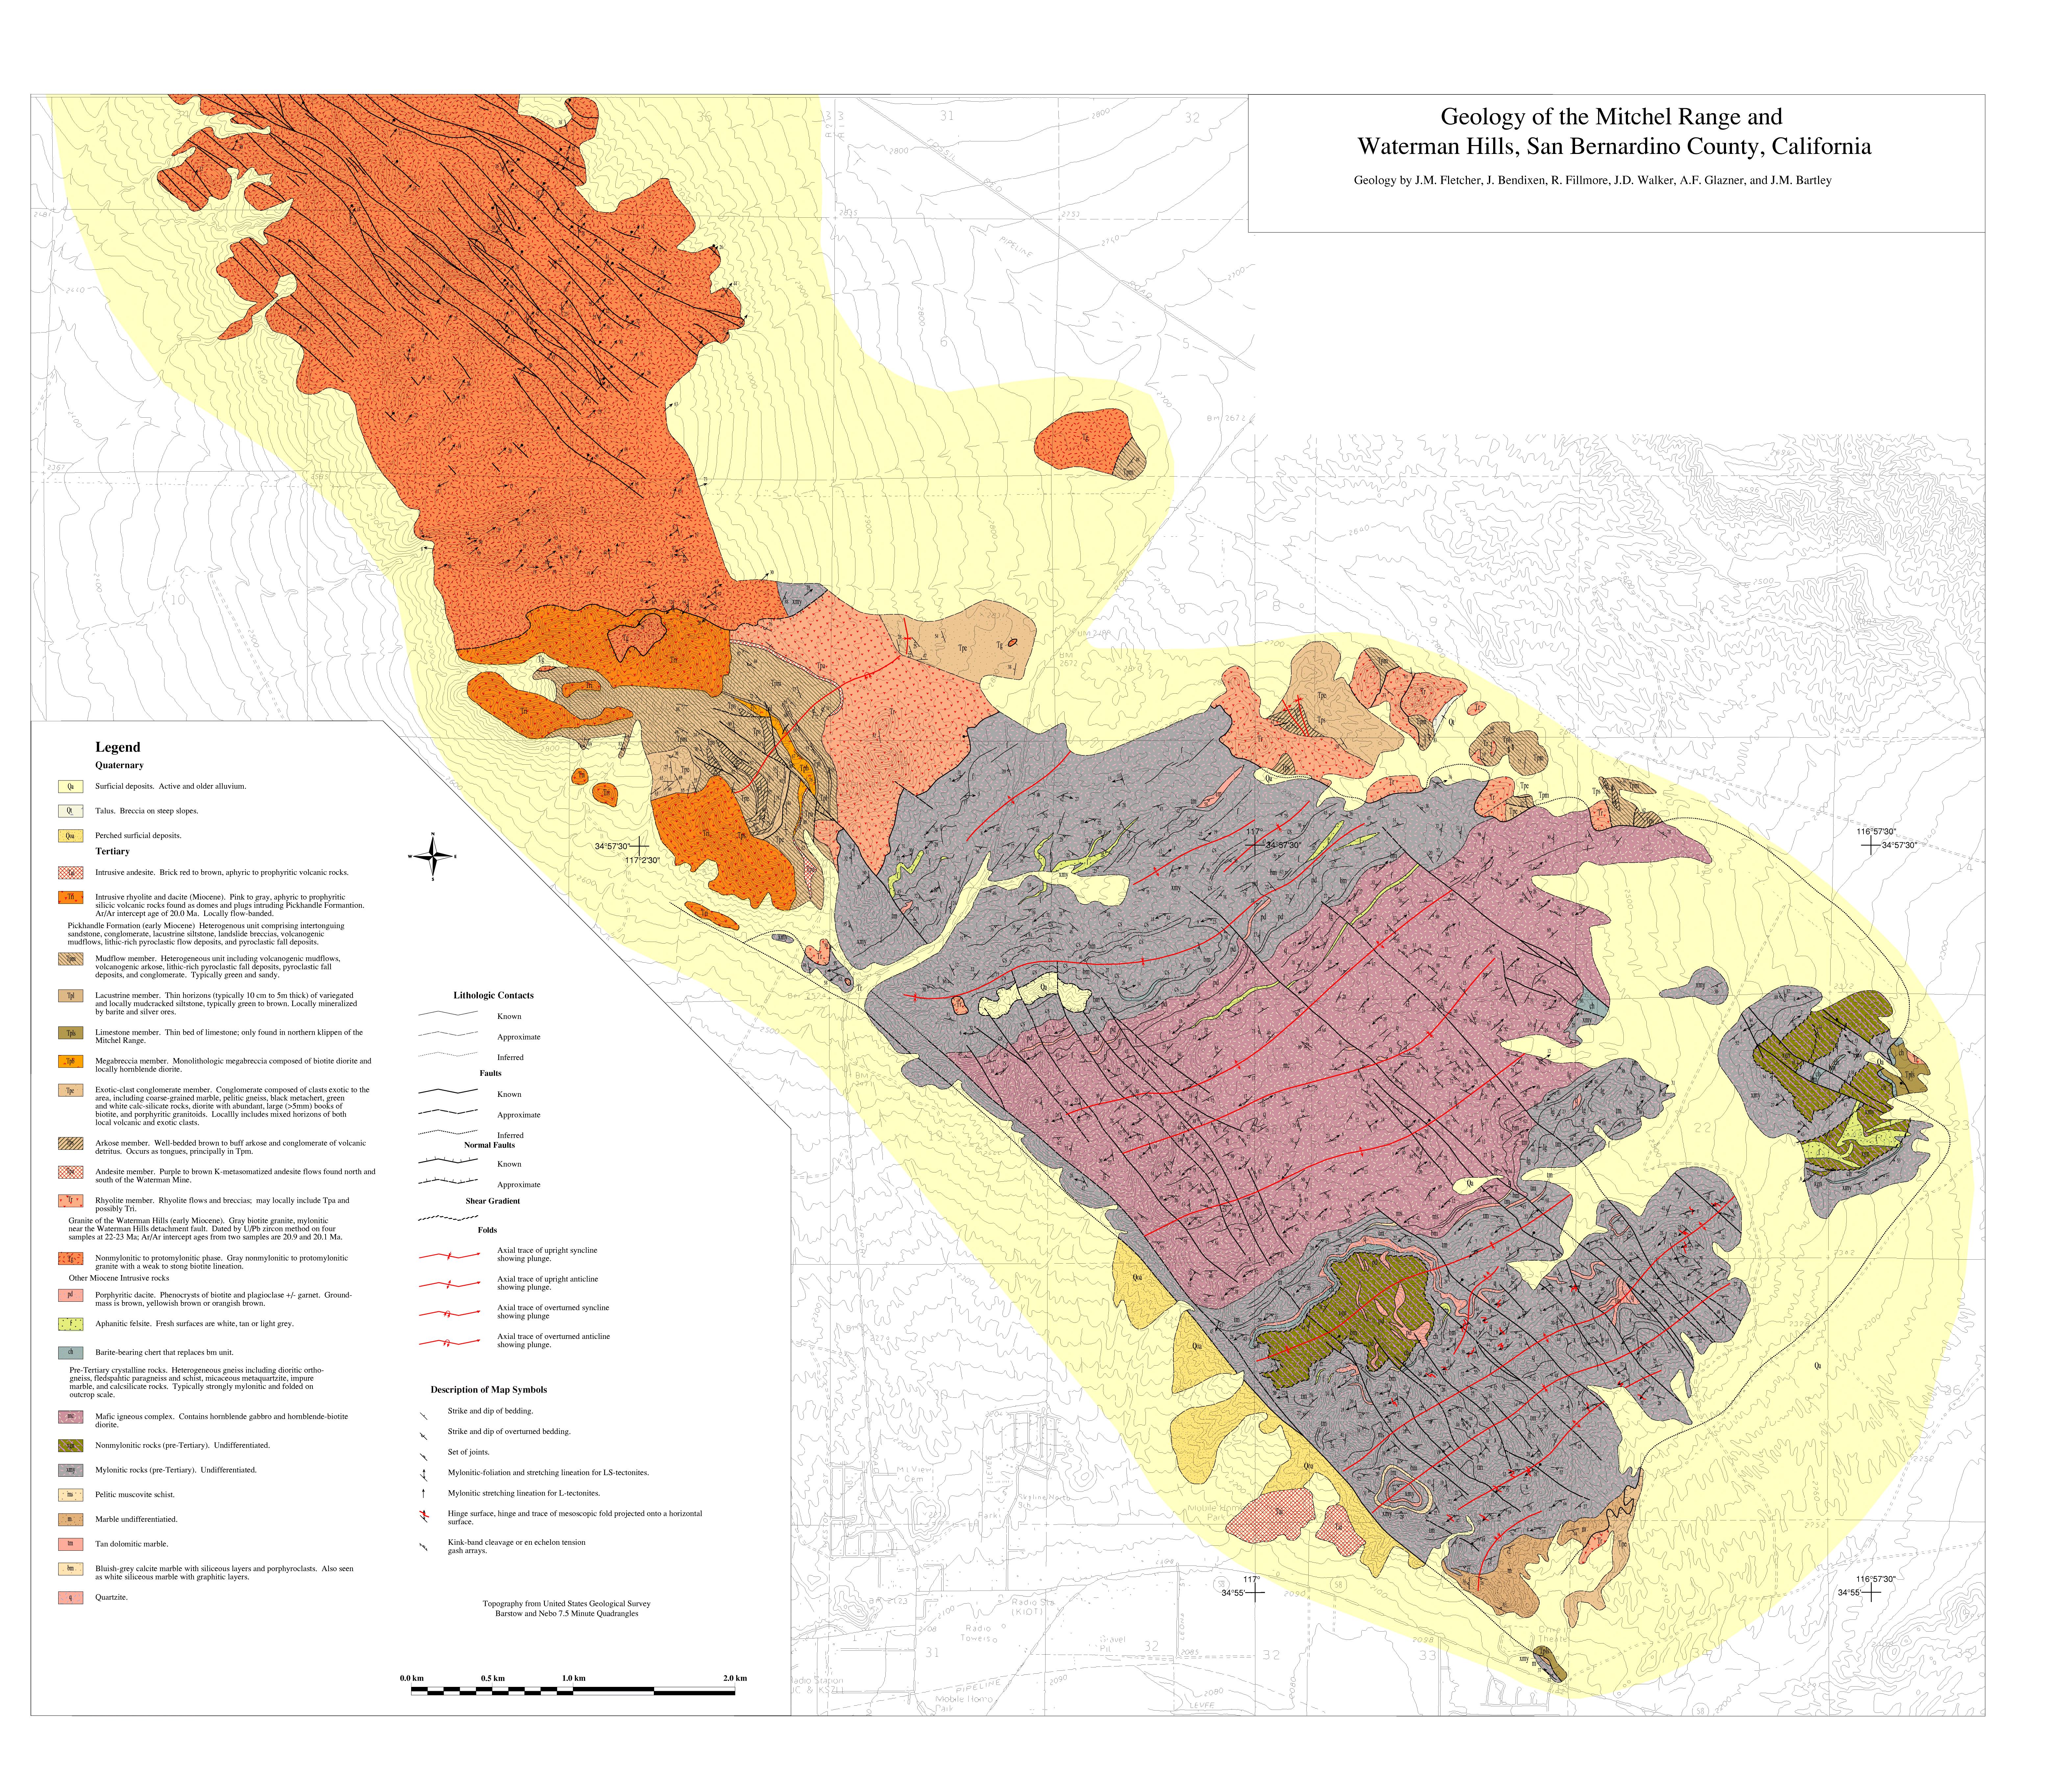 Geological Society of America - Digital Maps